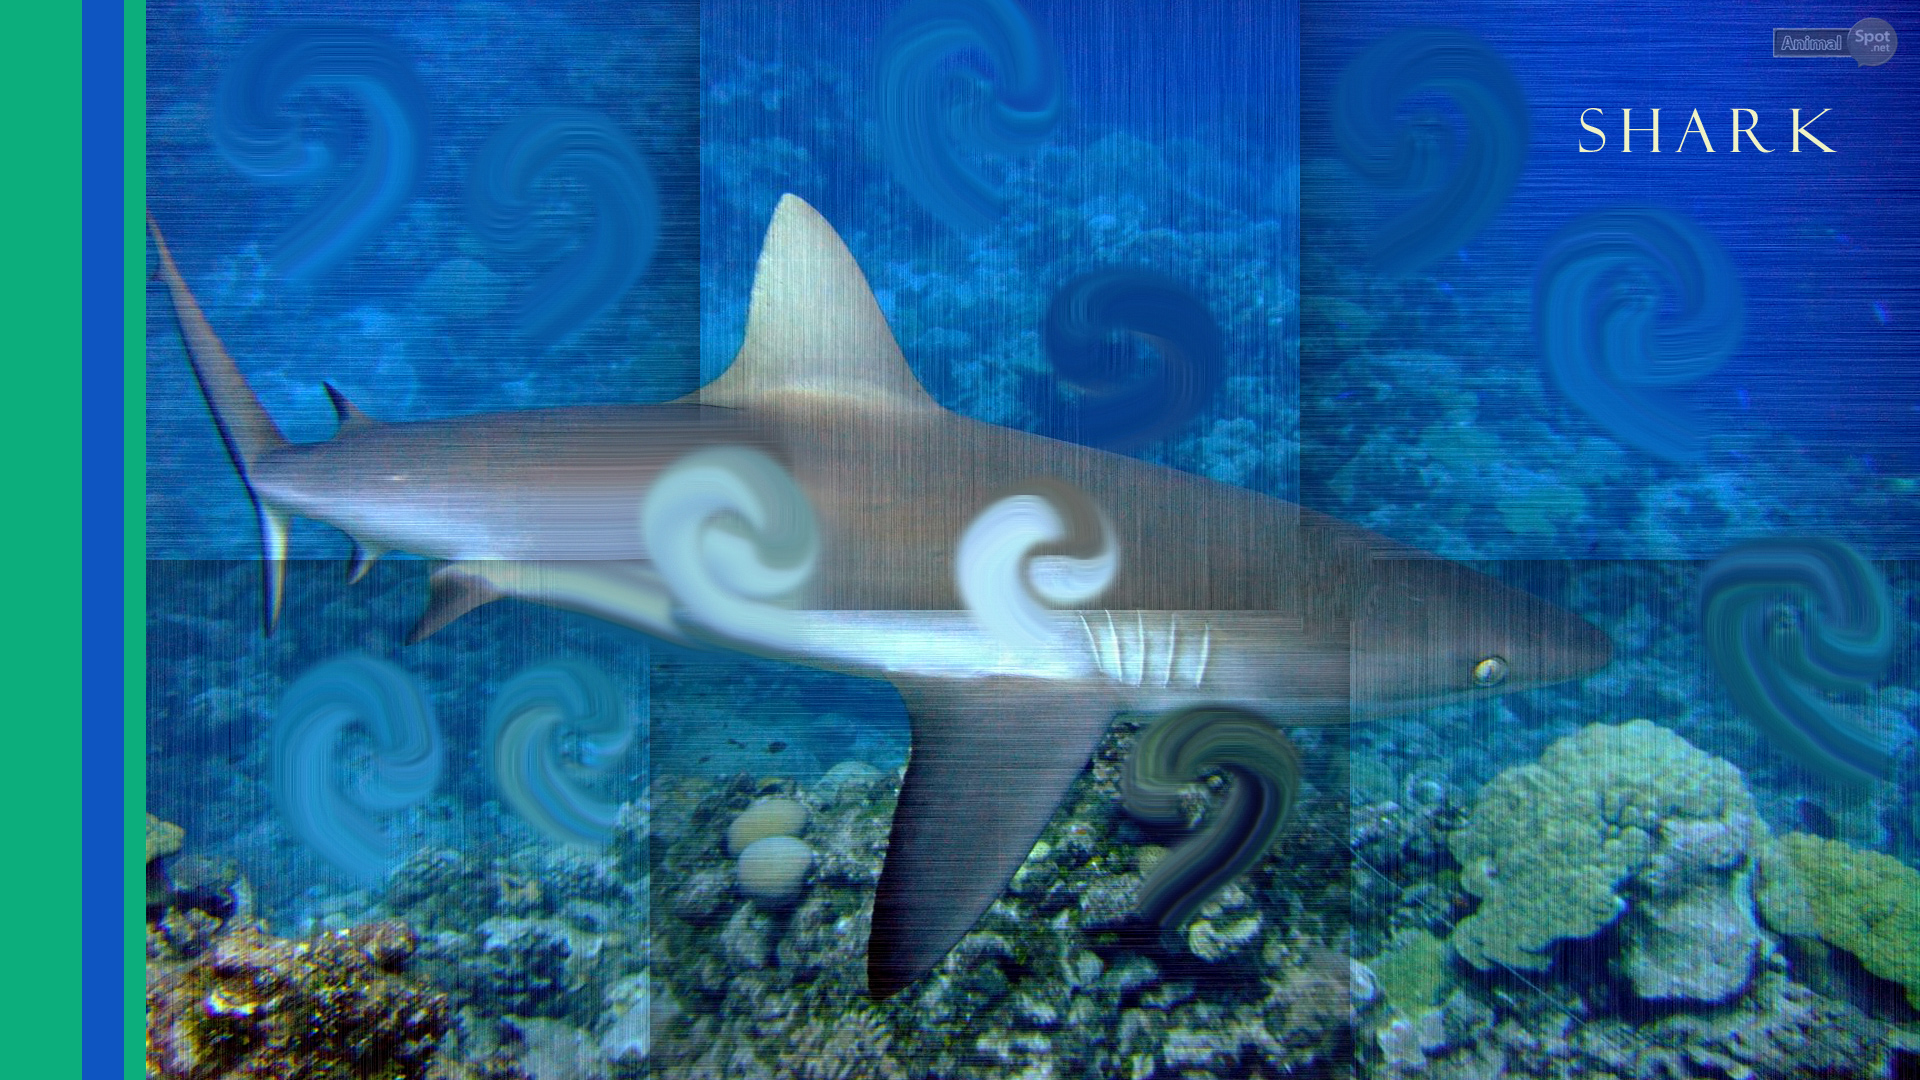 live shark wallpaper - photo #17